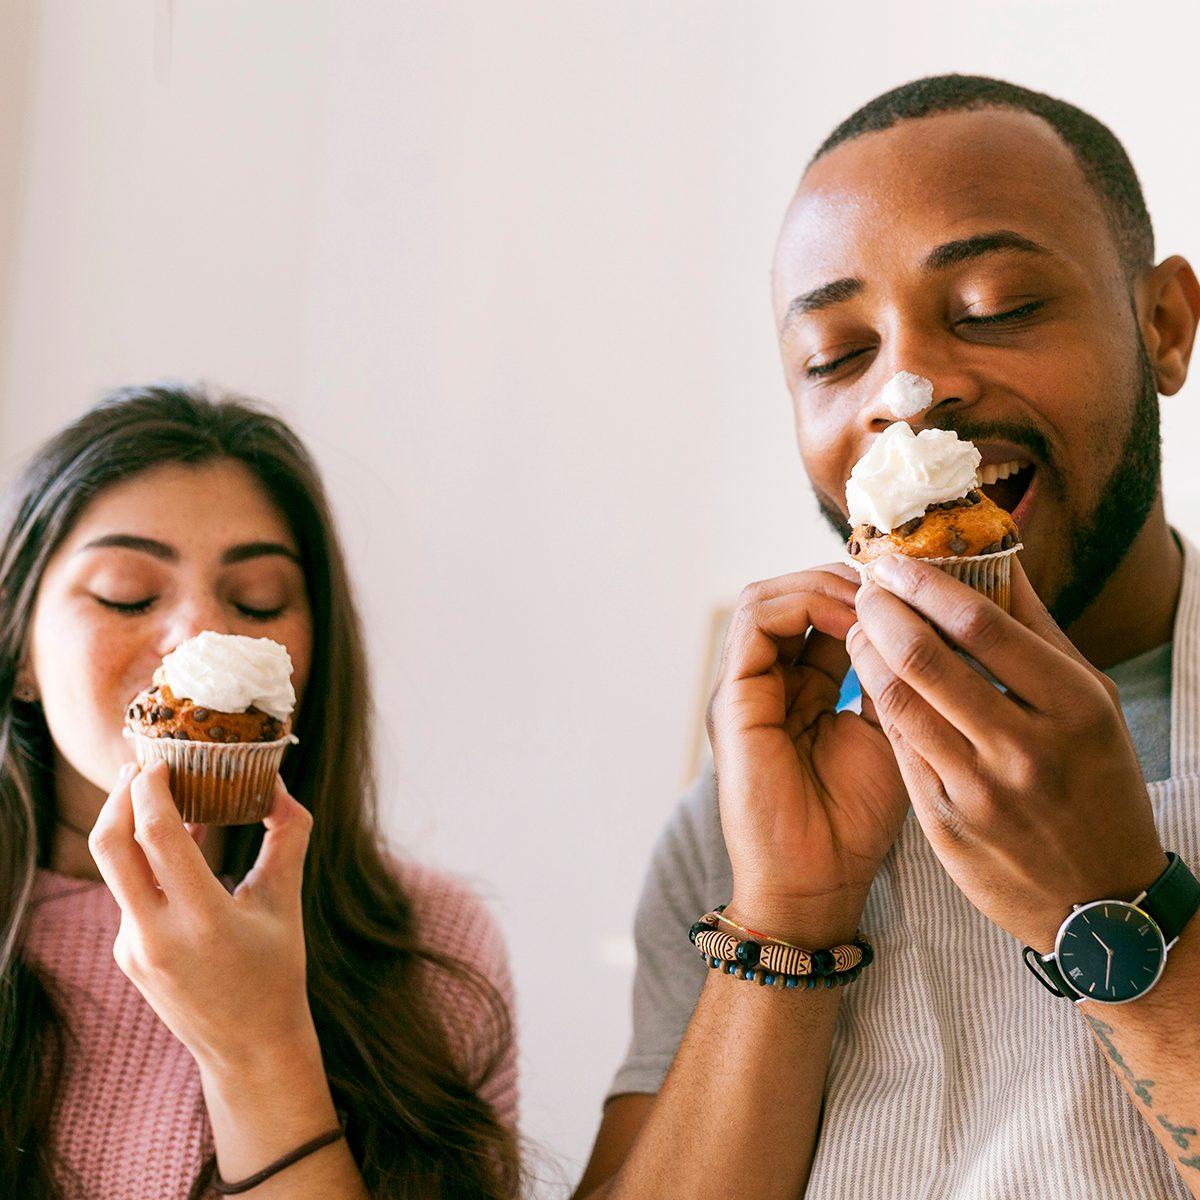 Young Couple Having Fun, Eating Fresh Cupcakes